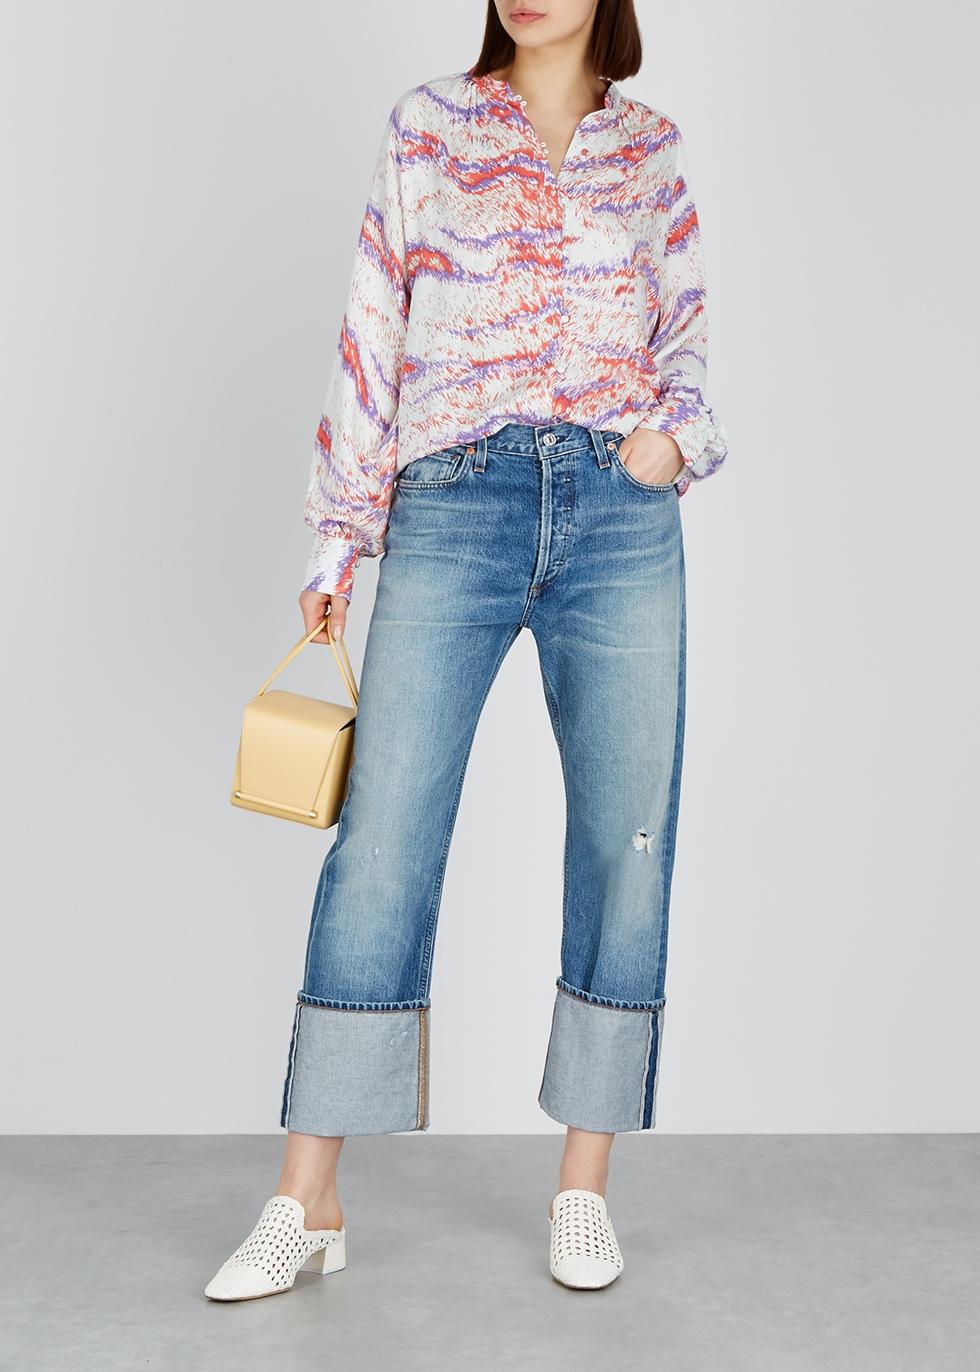 Sabine printed shirt - Hofmann